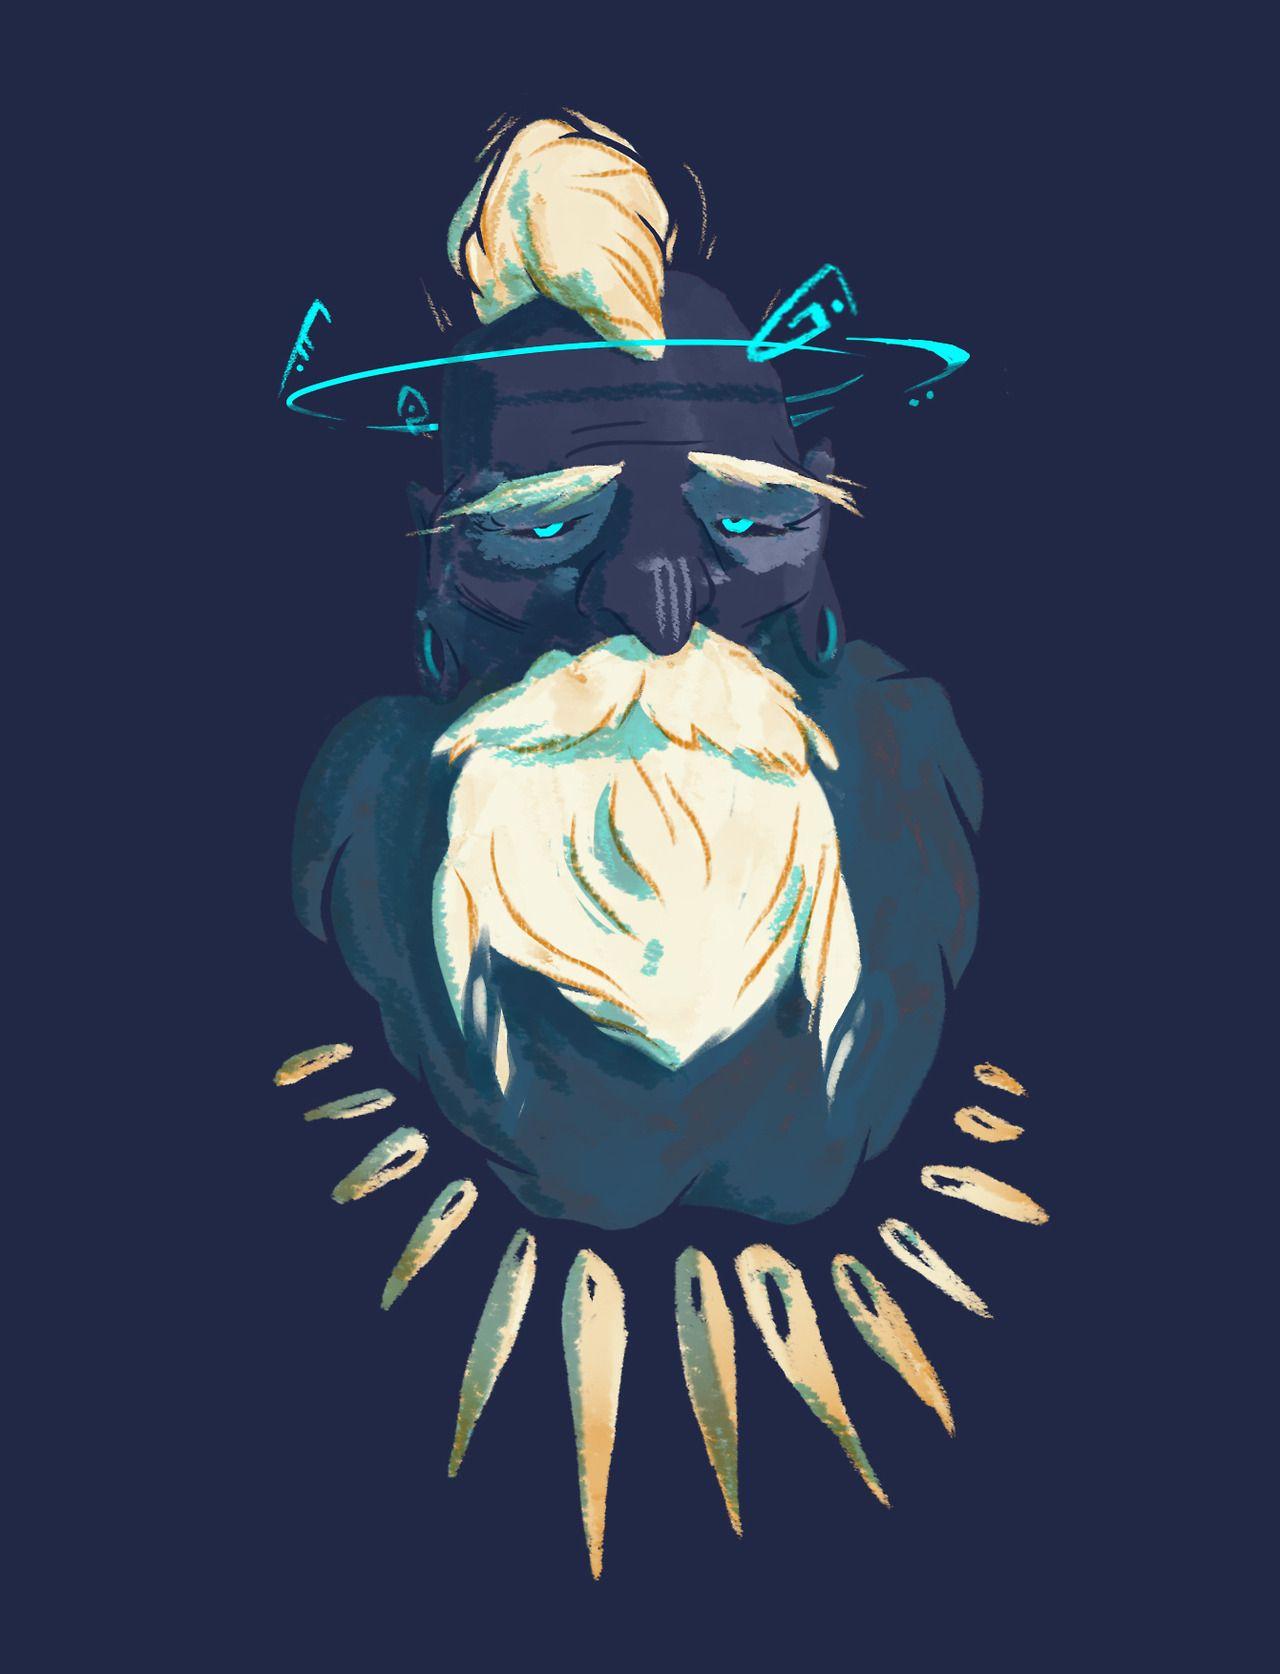 #chaman #native #whitewalker  joel-durand.tumblr.com